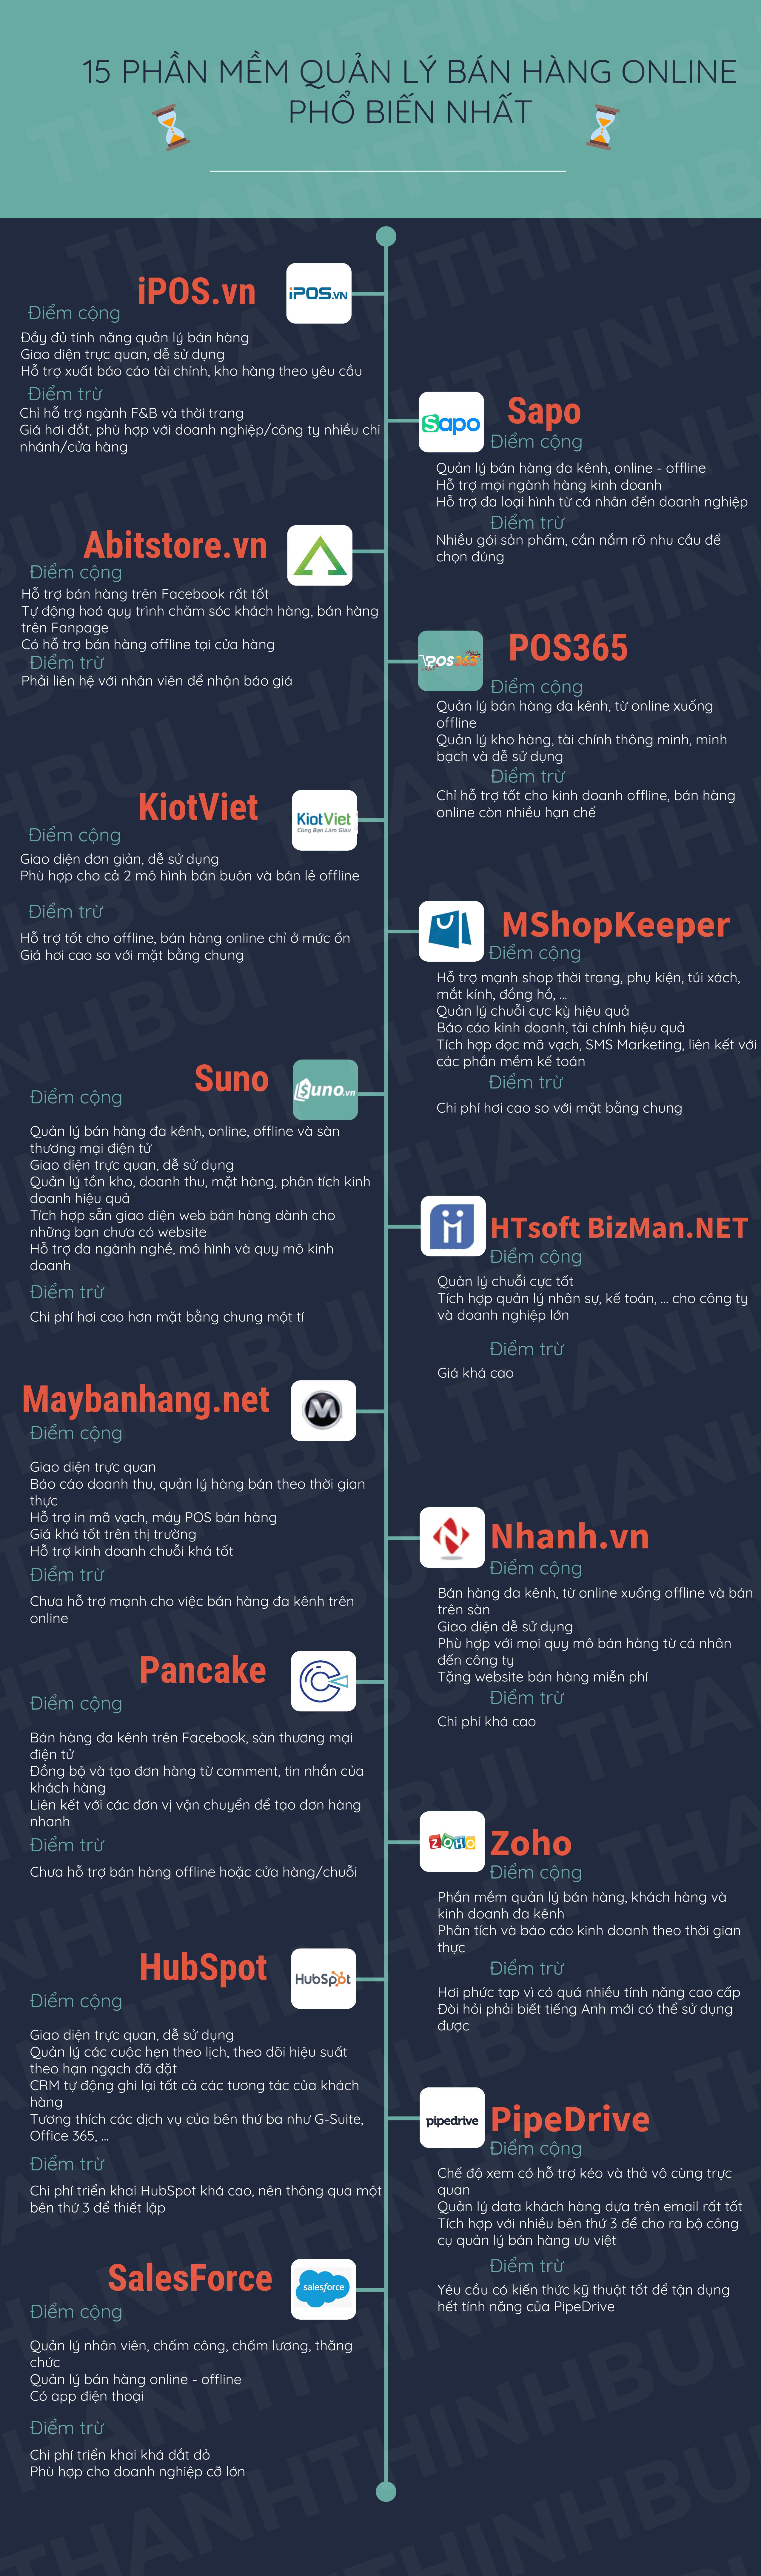 phan-mem-quan-ly-ban-hang-infographic